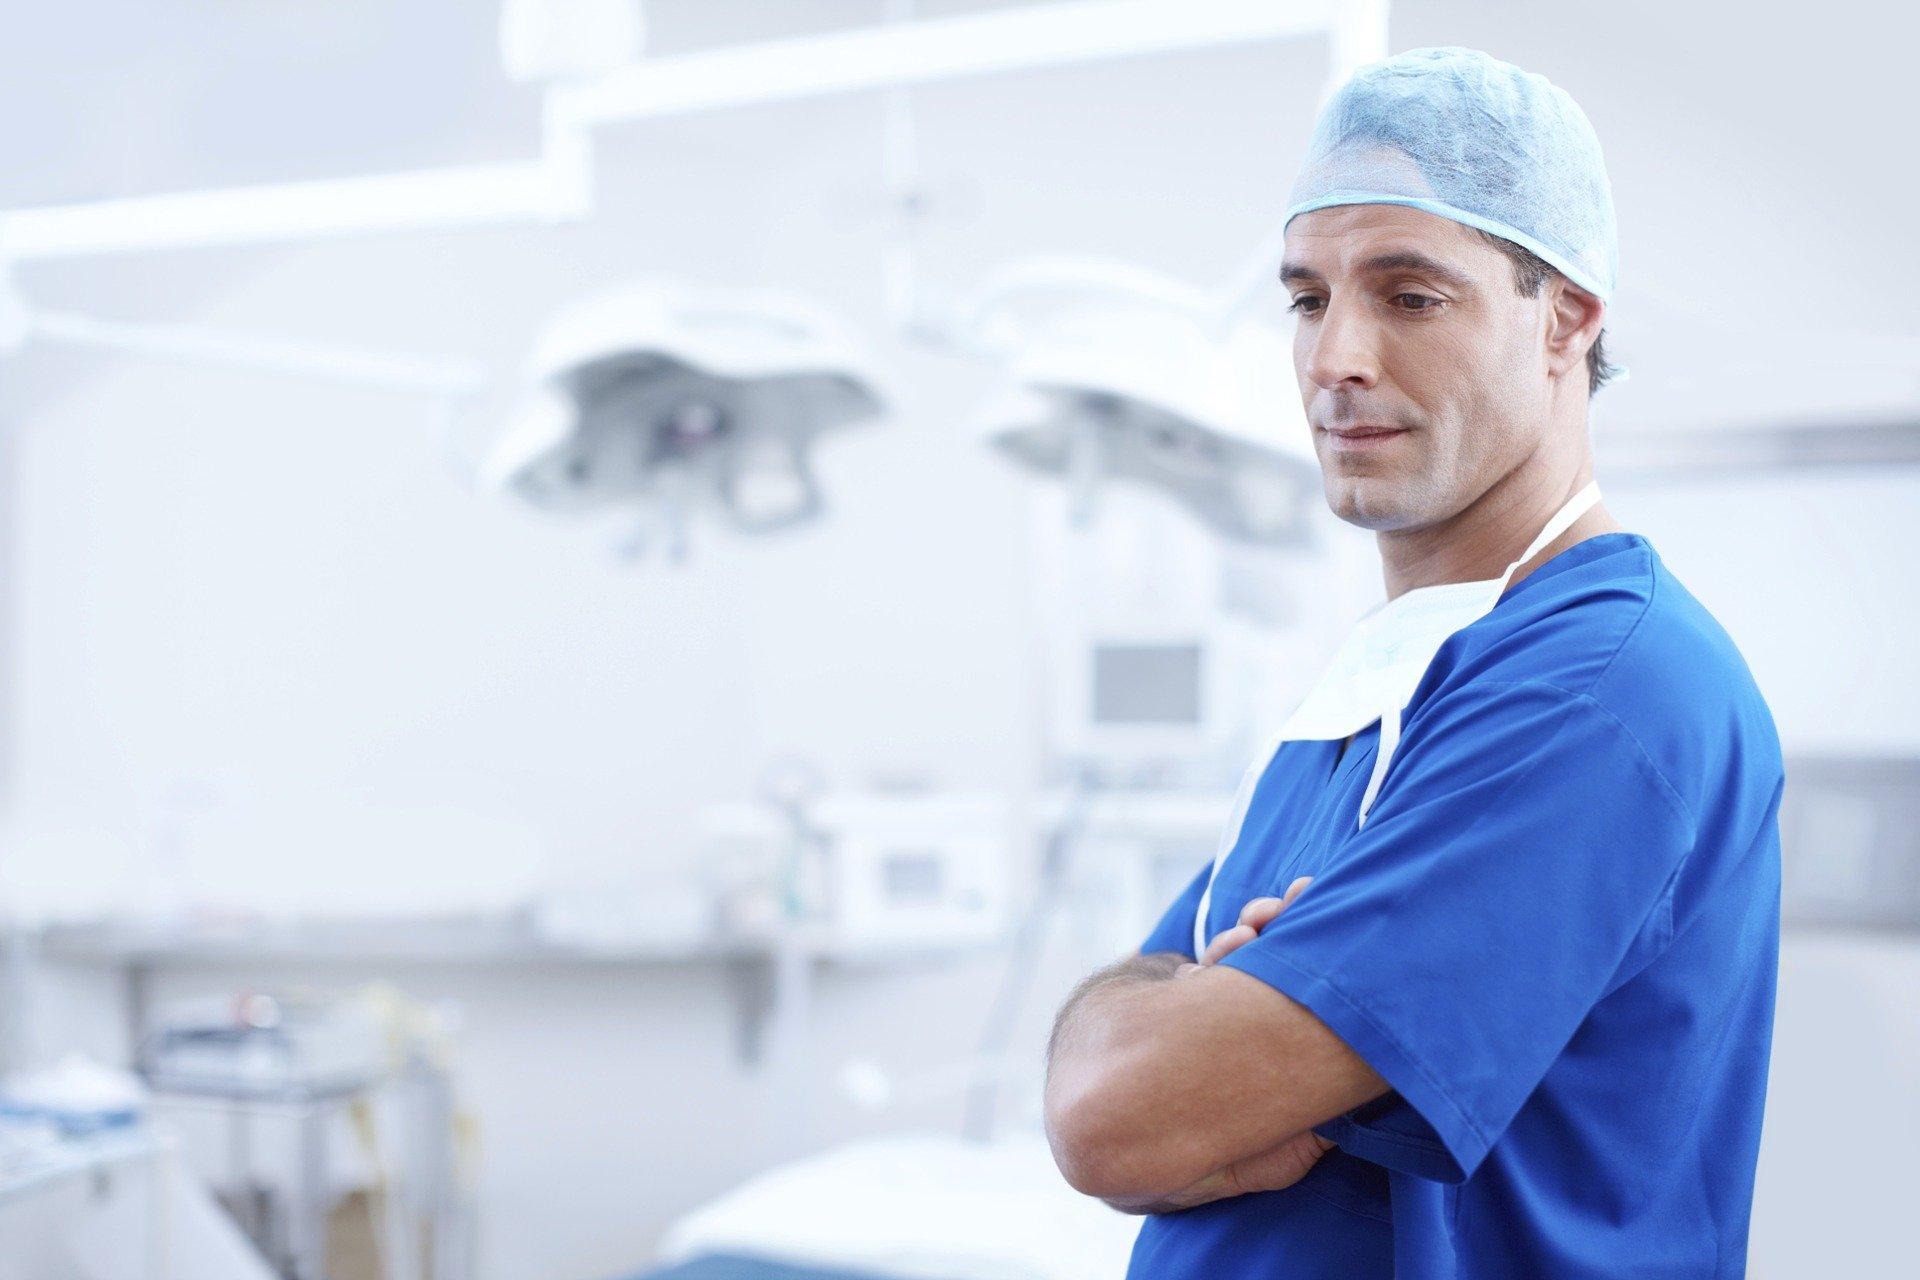 Medical/Health Care/Nursing